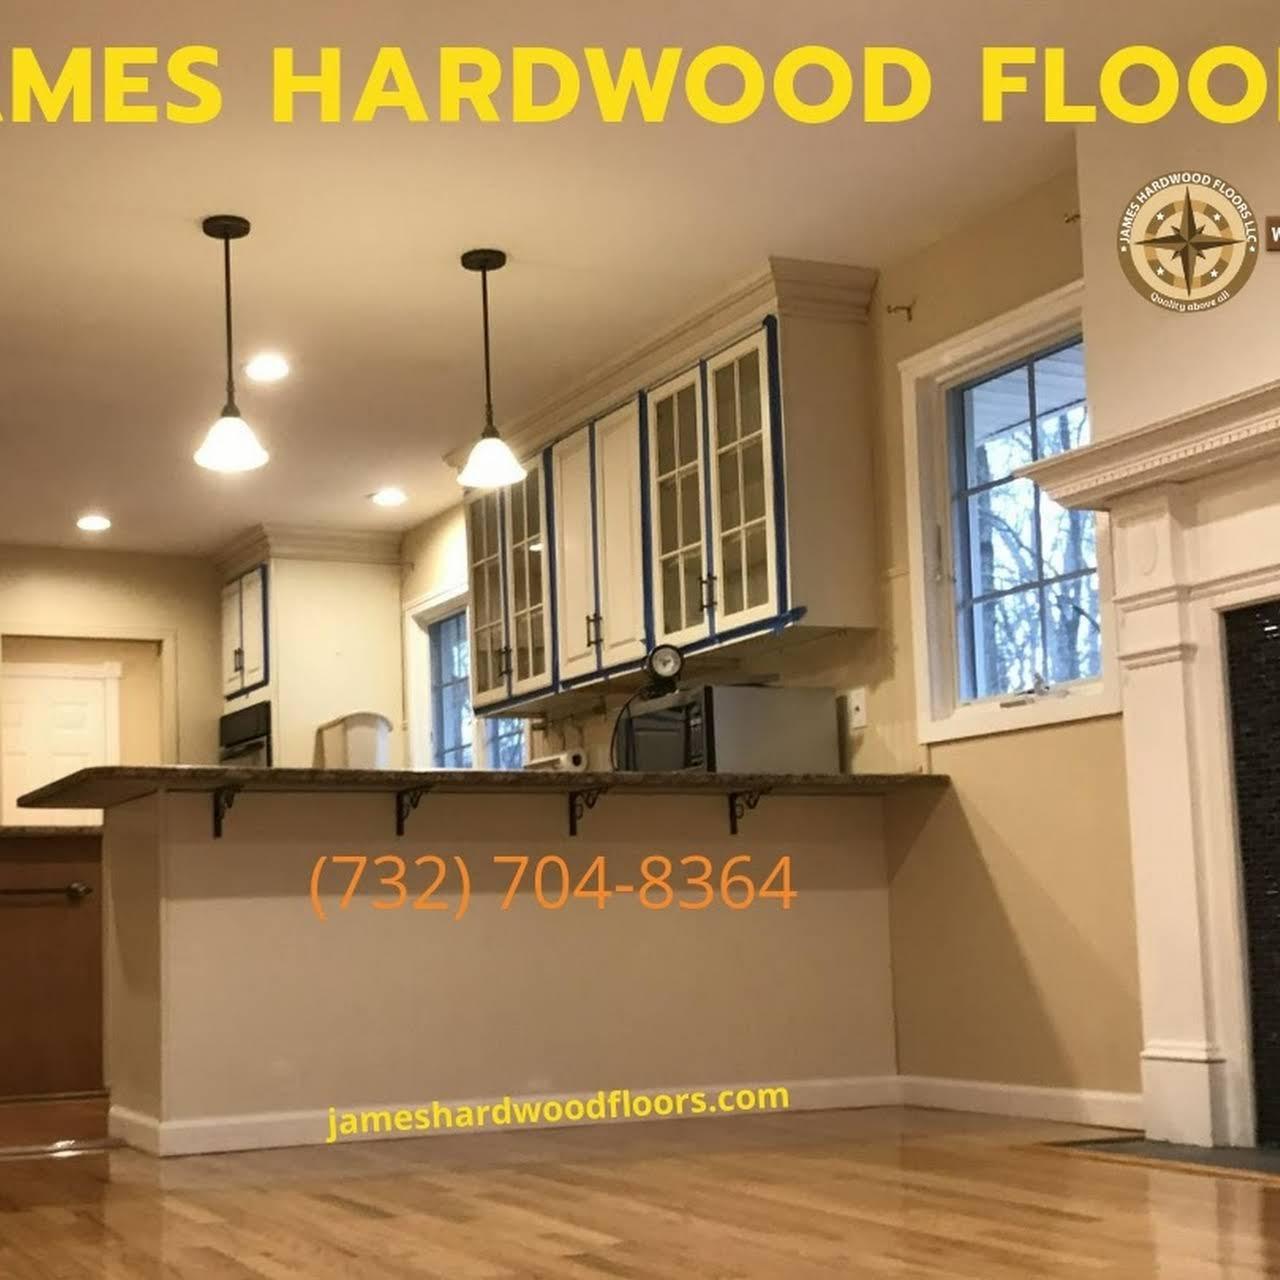 hardwood flooring fairfield nj of james hardwood floorsa llc local contractor no retail price again regarding are you looking f